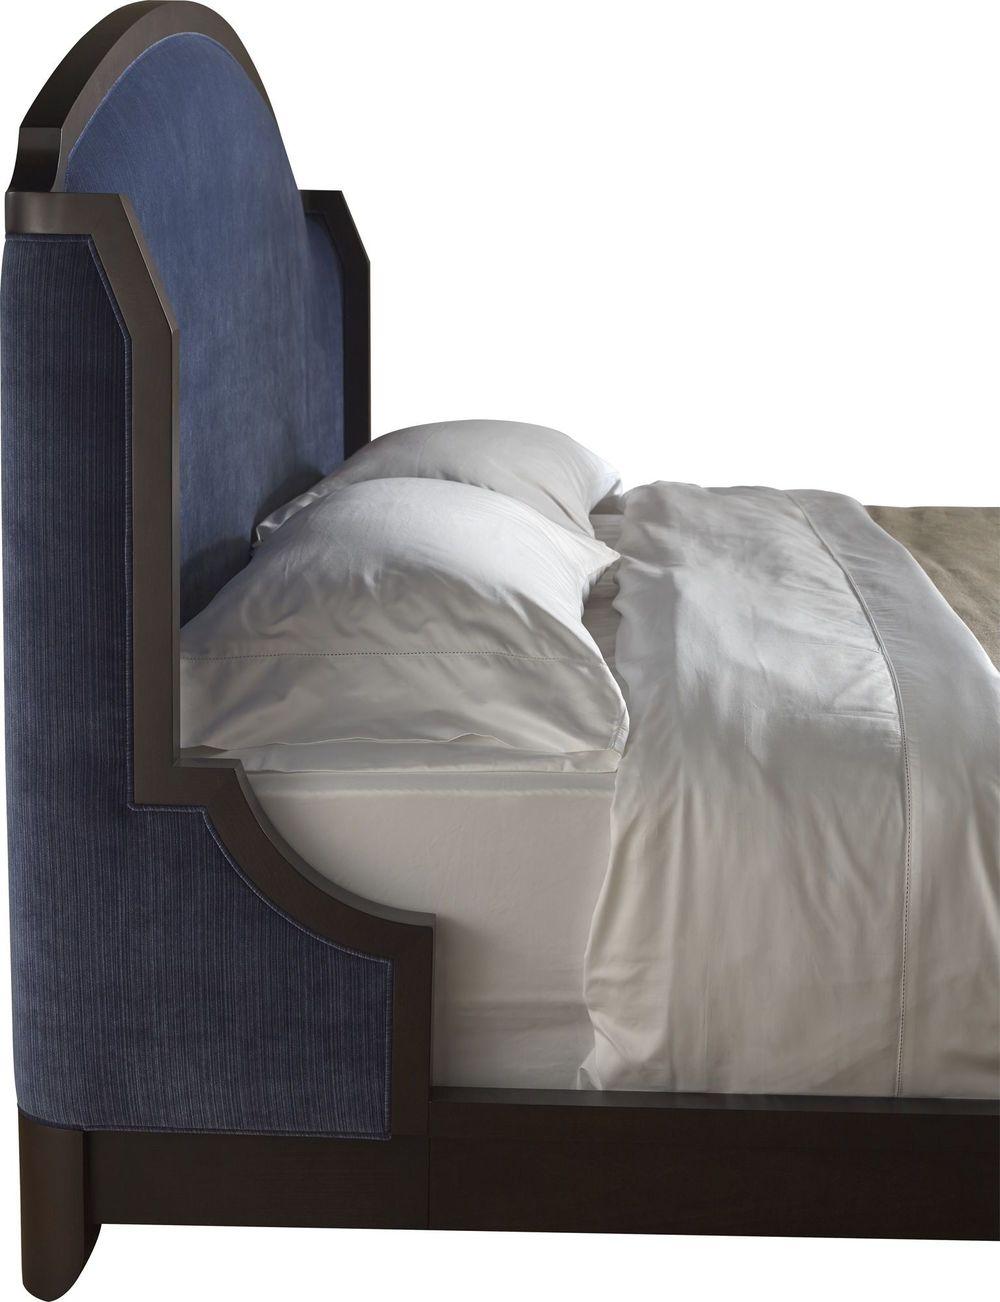 Baker Furniture - Arabesque Bed